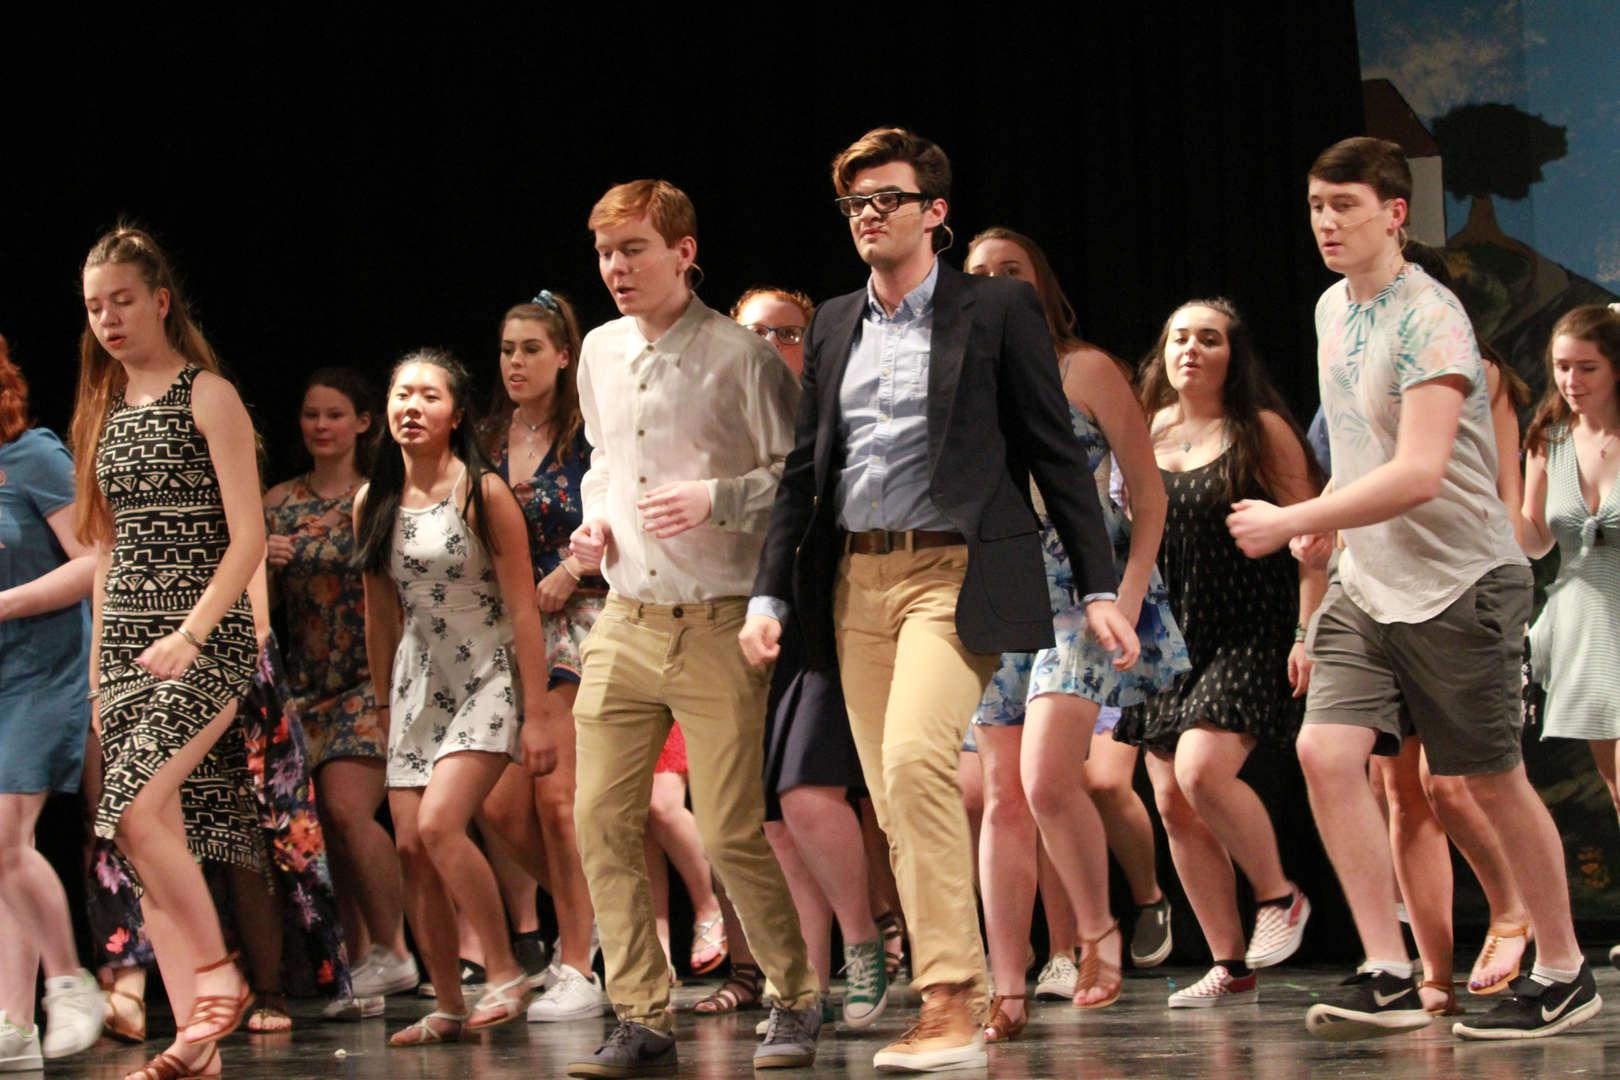 HS boys dancing